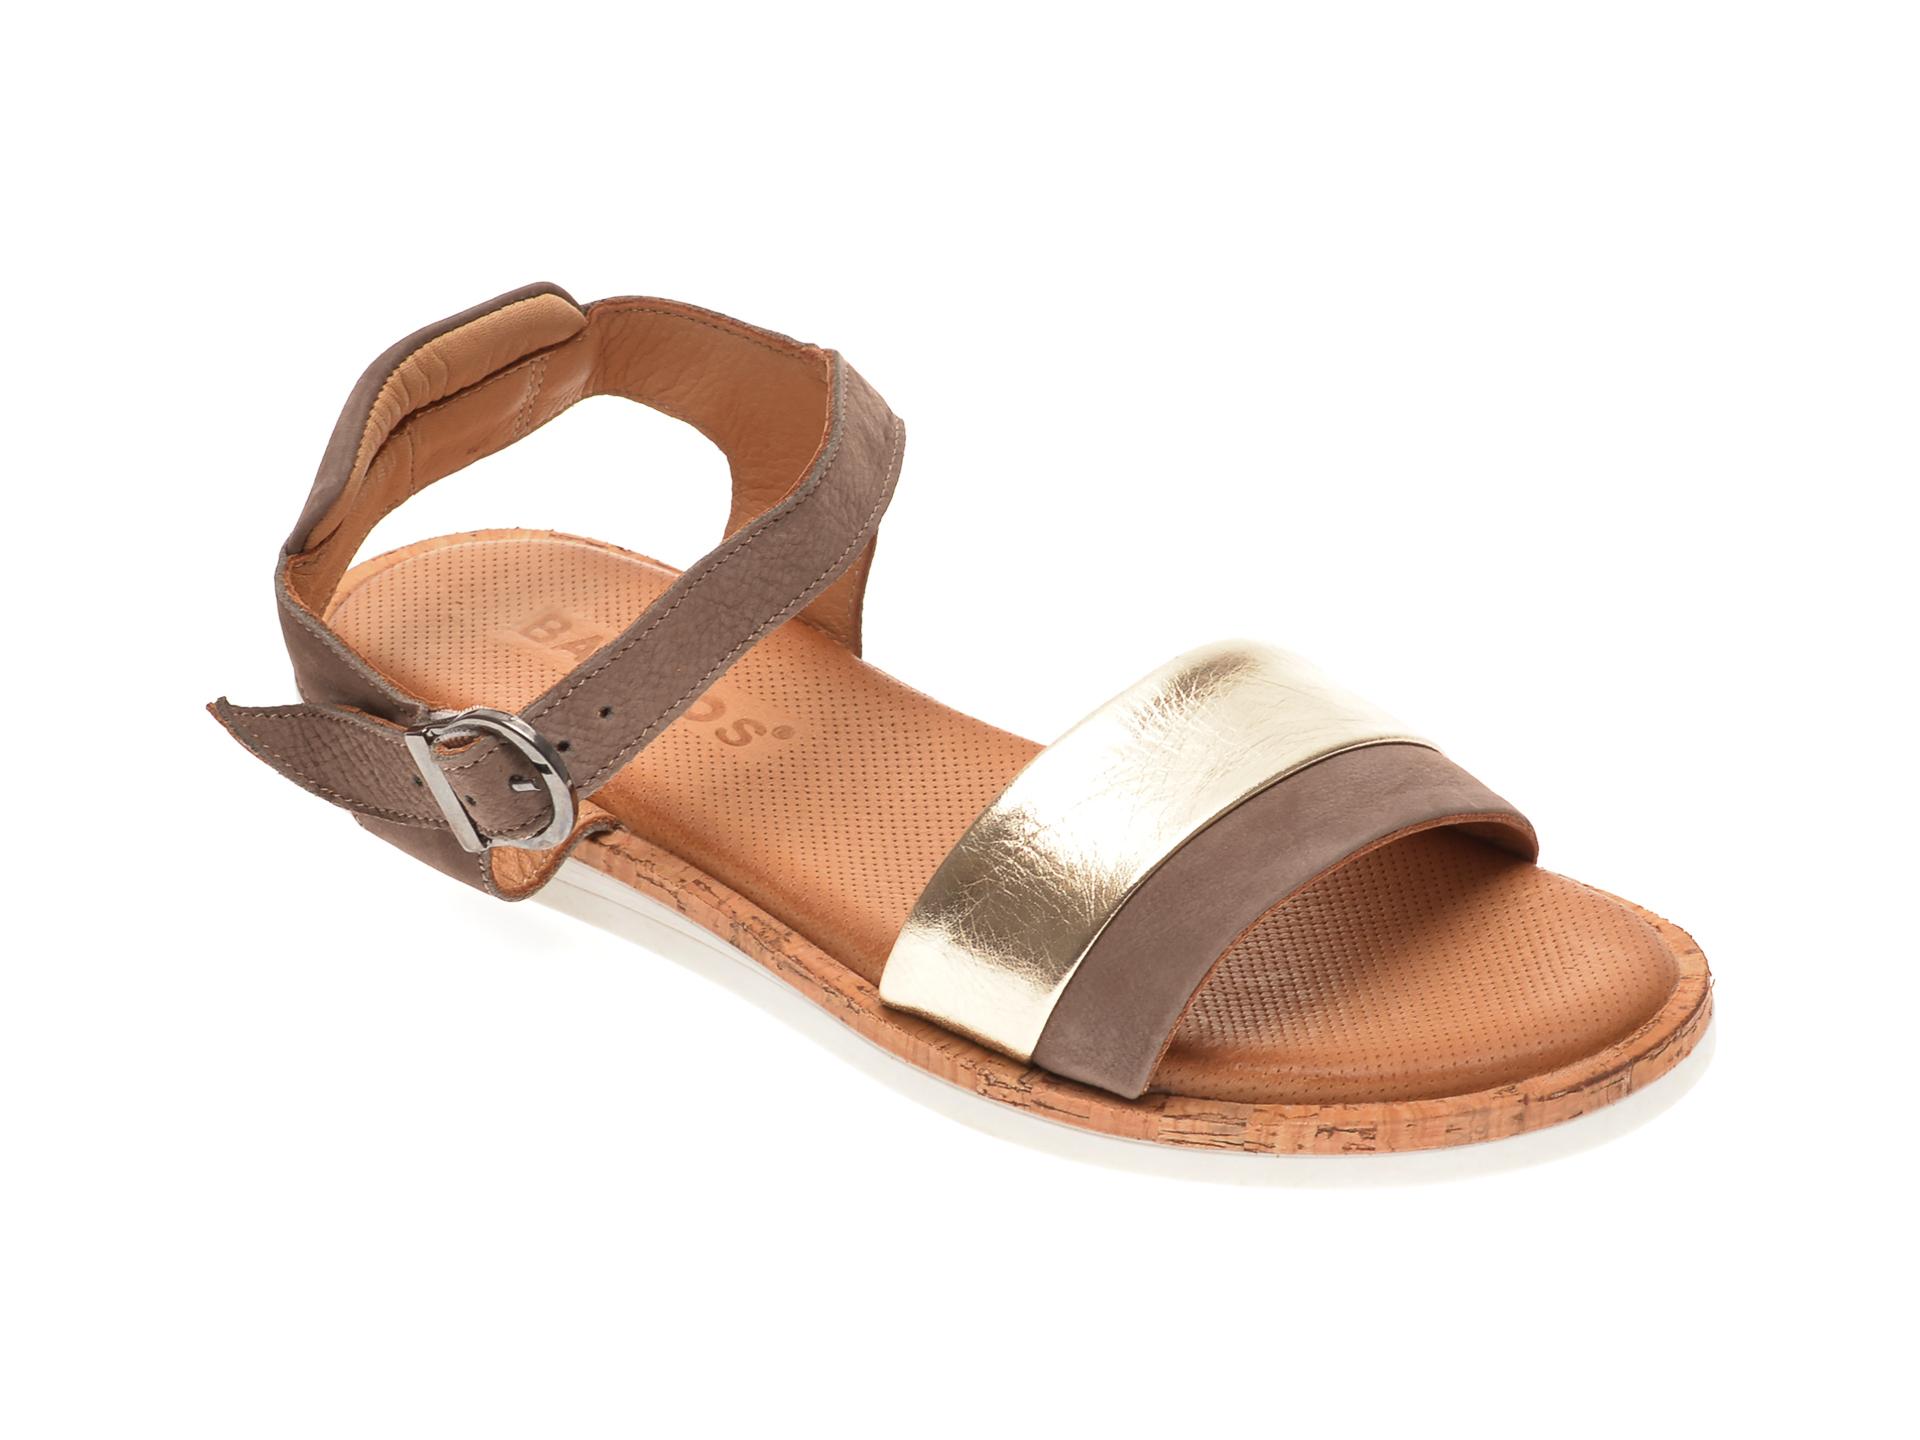 Sandale BABOOS aurii, 3101, din piele naturala imagine